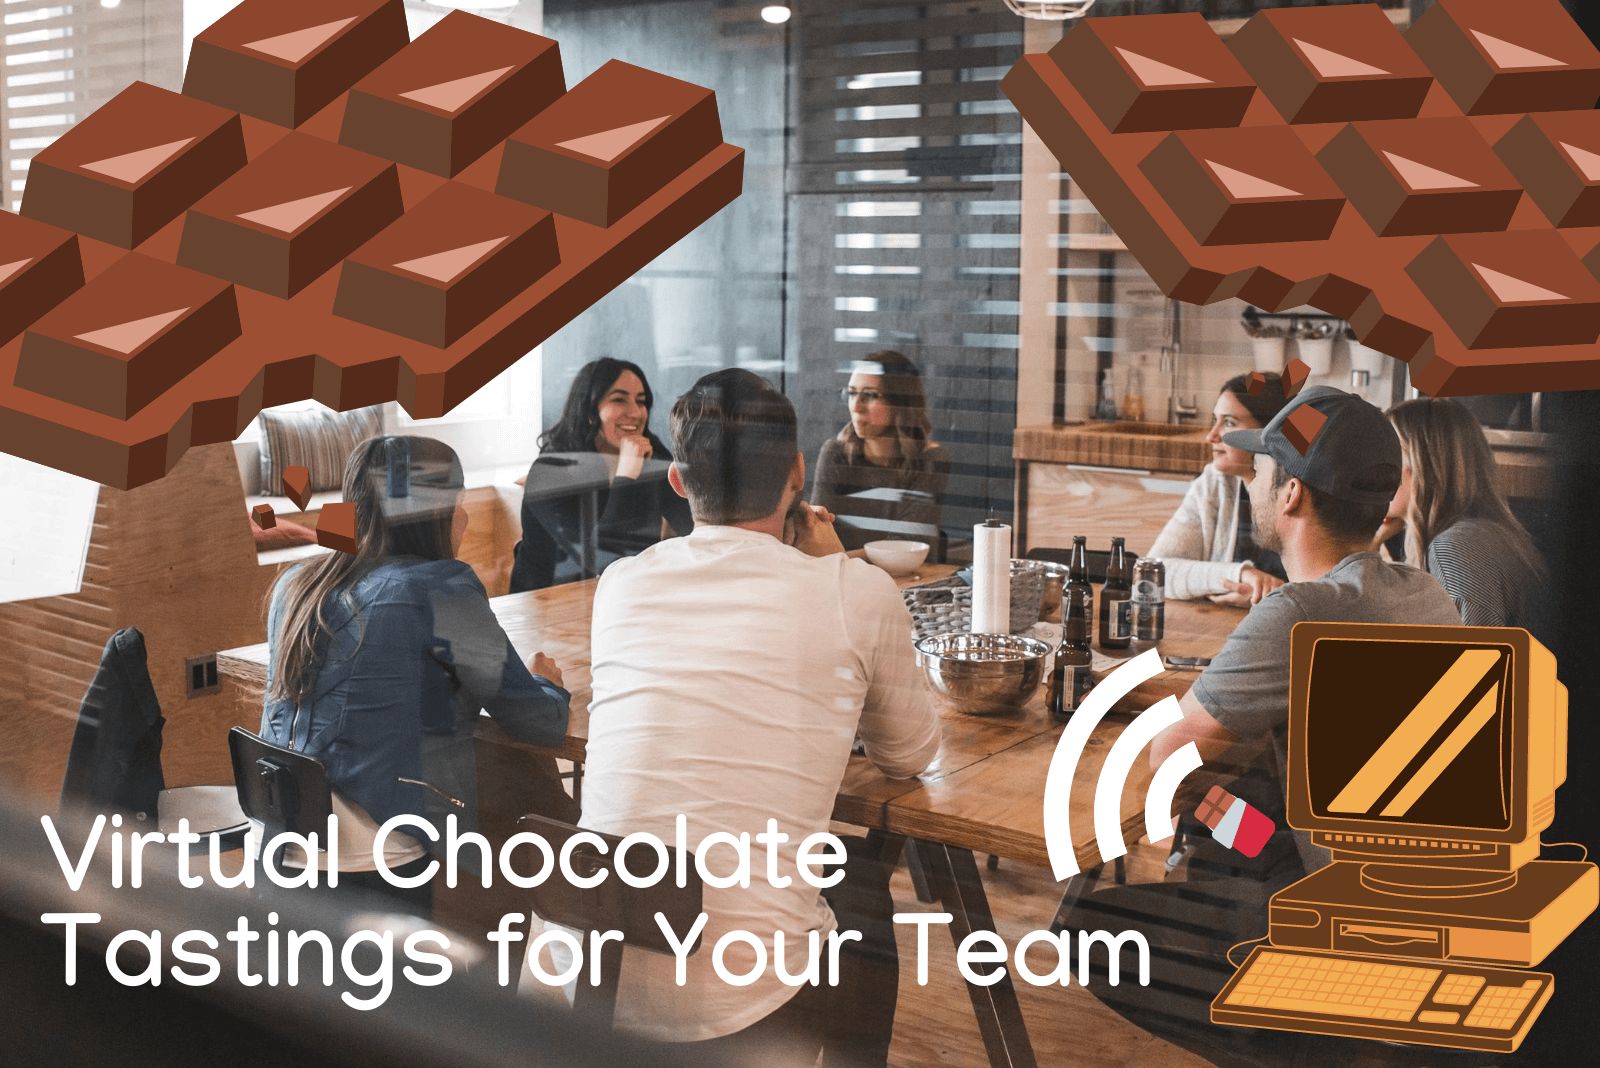 Corporate Virtual Chocolate Tastings